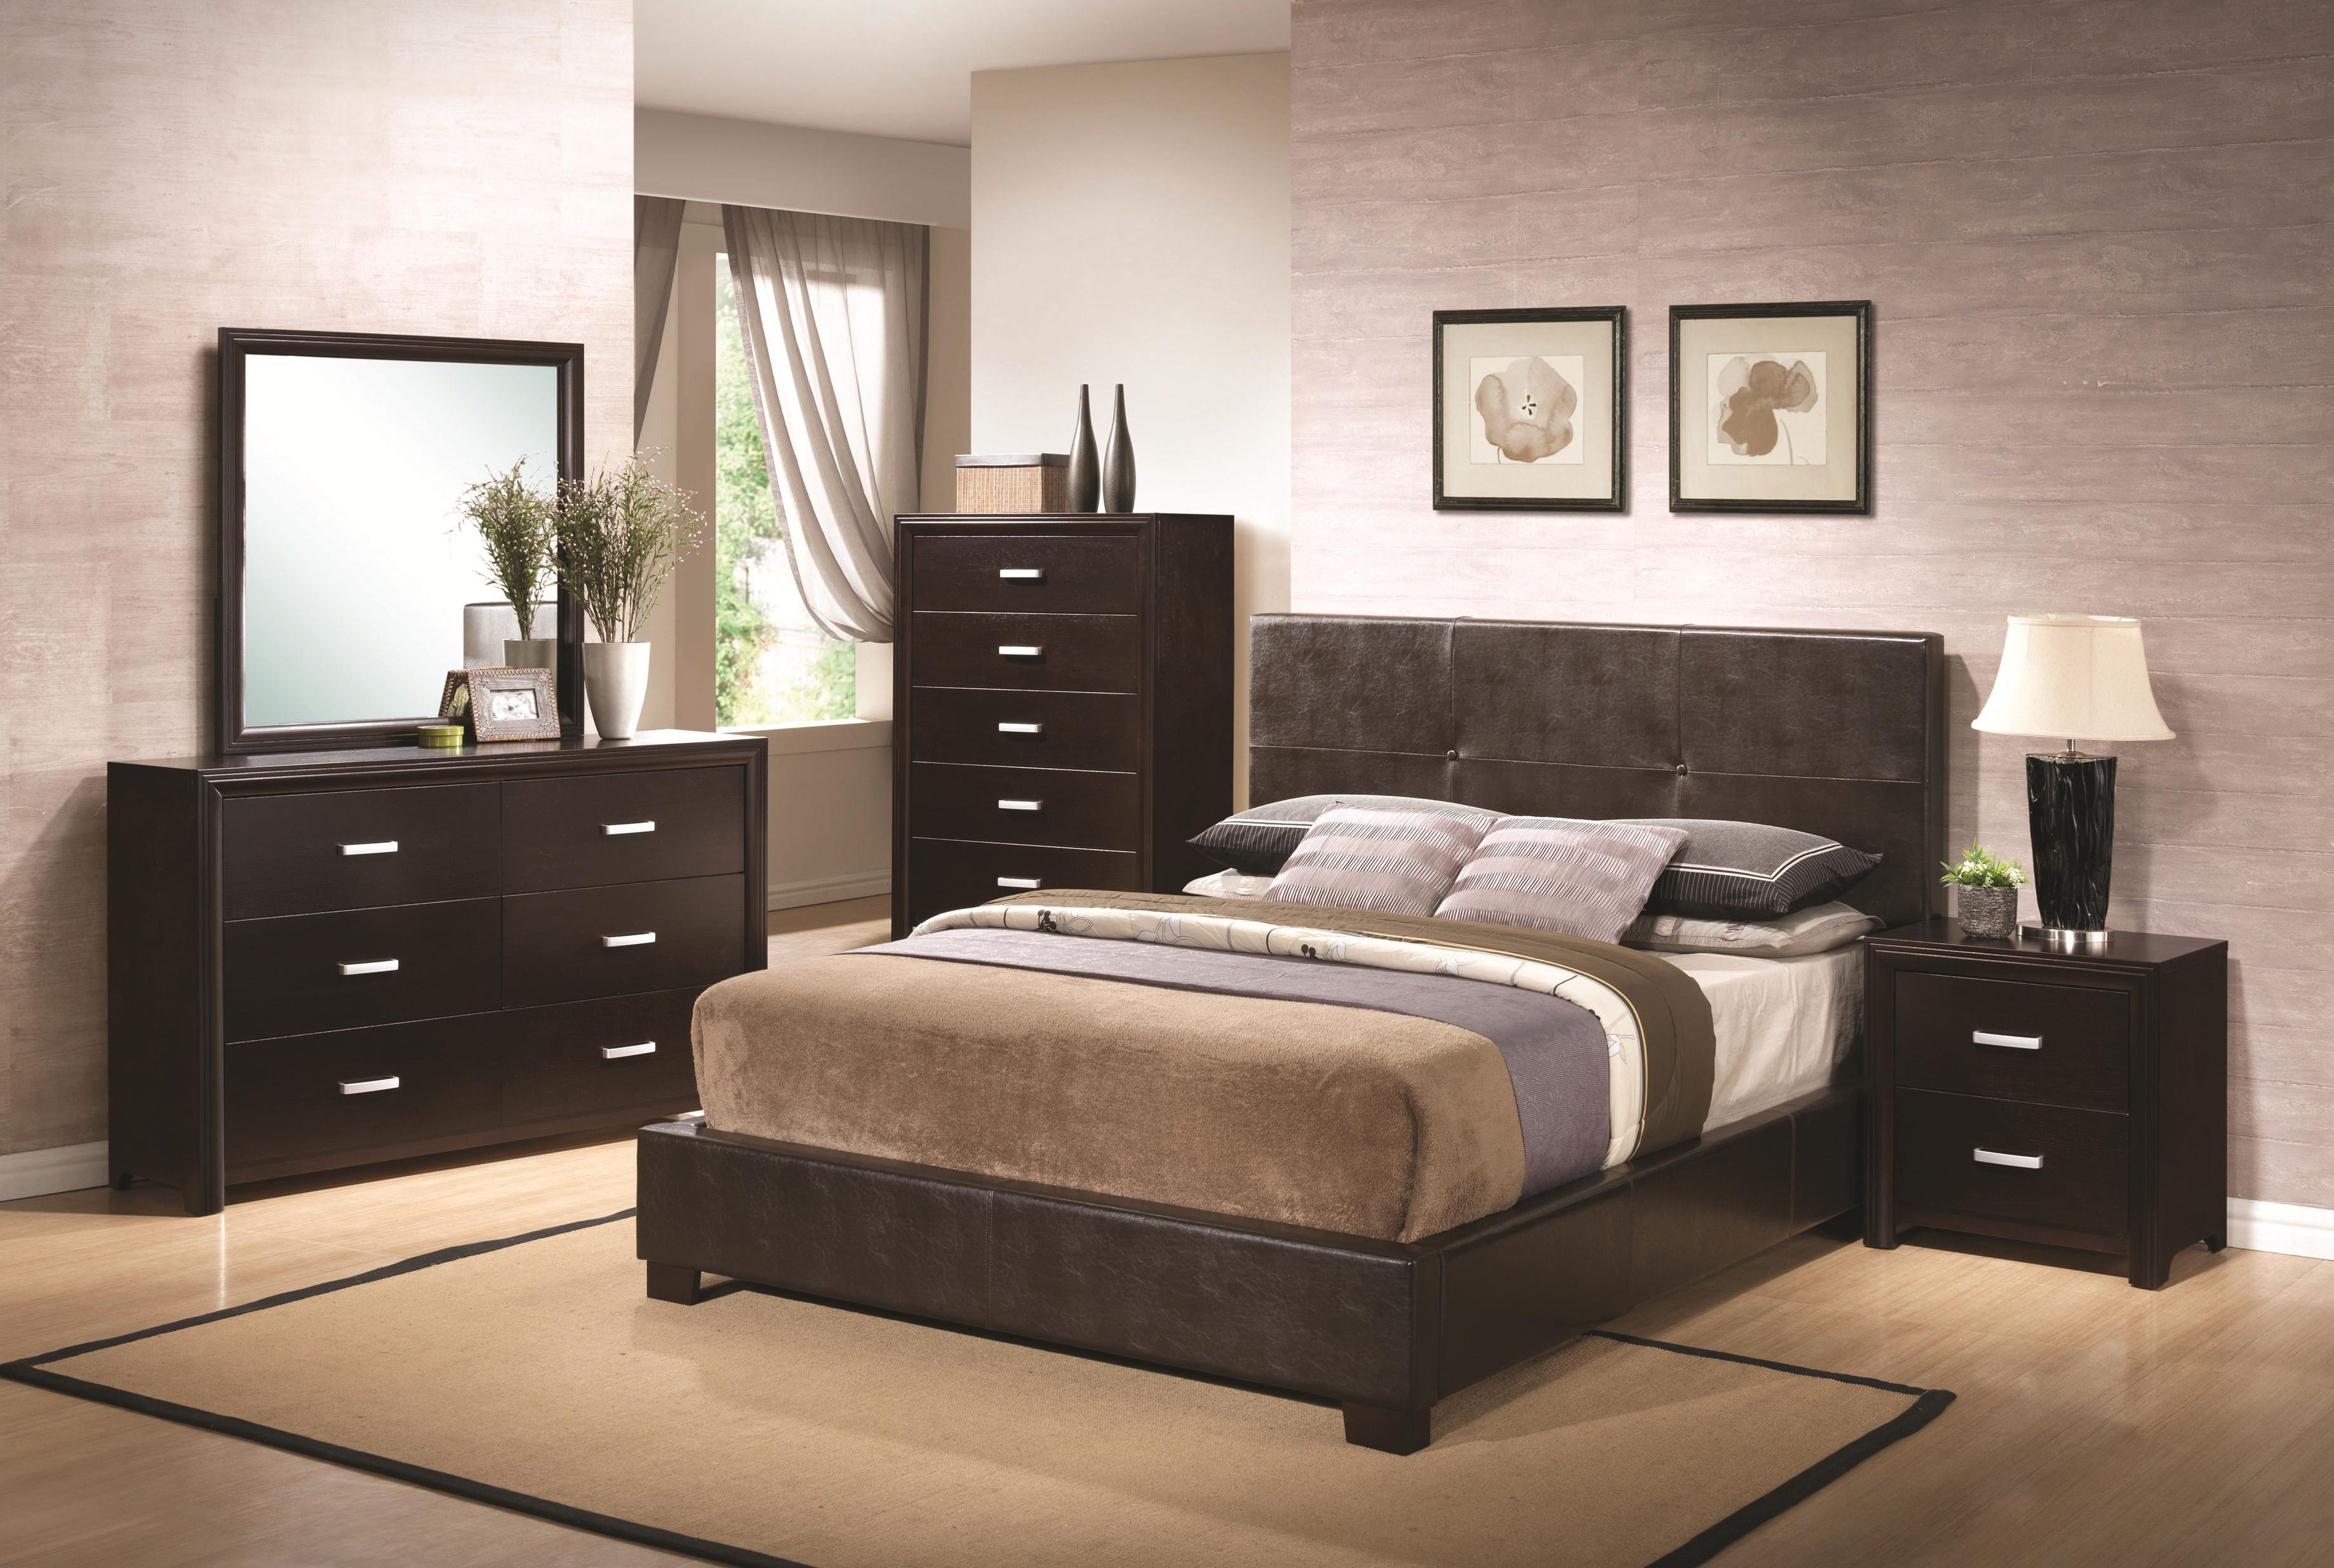 black bedroom furniture sets ikea photo - 7